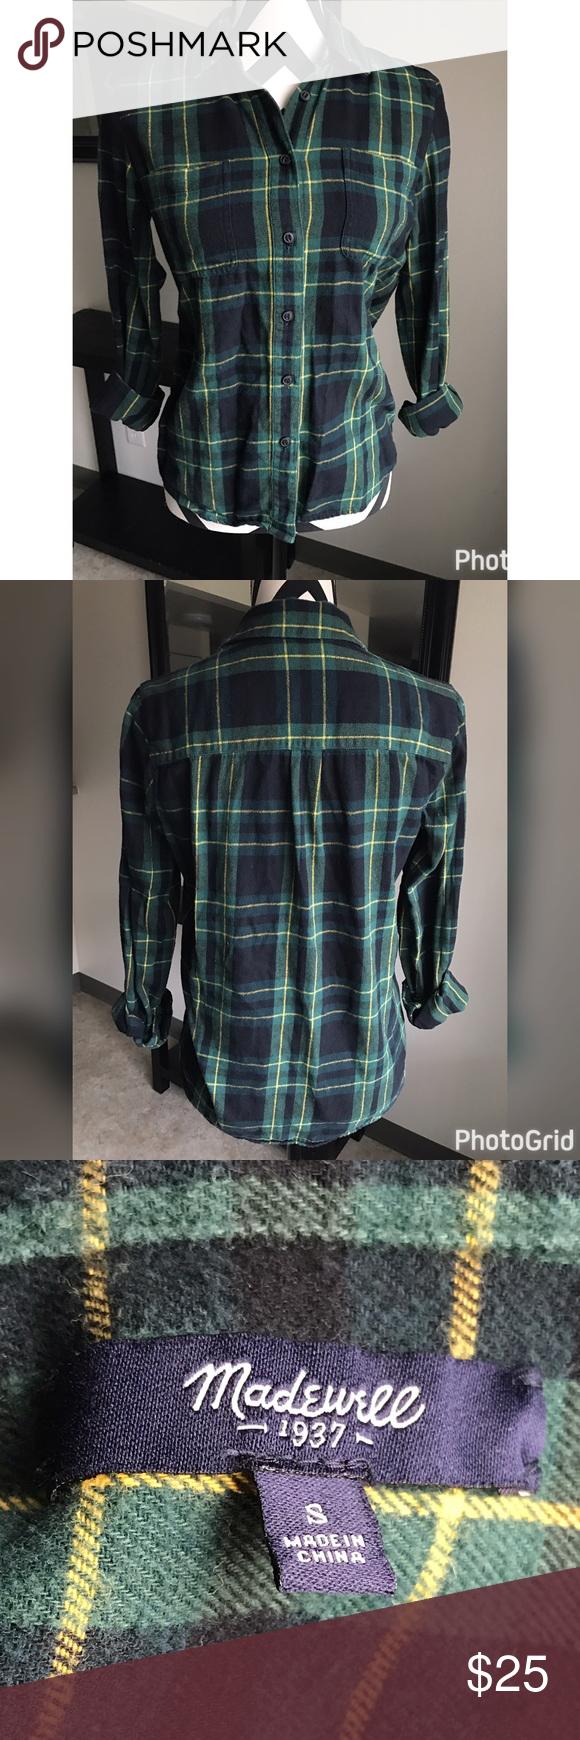 Flannel shirt xs  MADEWELL PLAID FLANNEL SHIRT oversized SZ XS MADEWELL PLAID FLANNEL